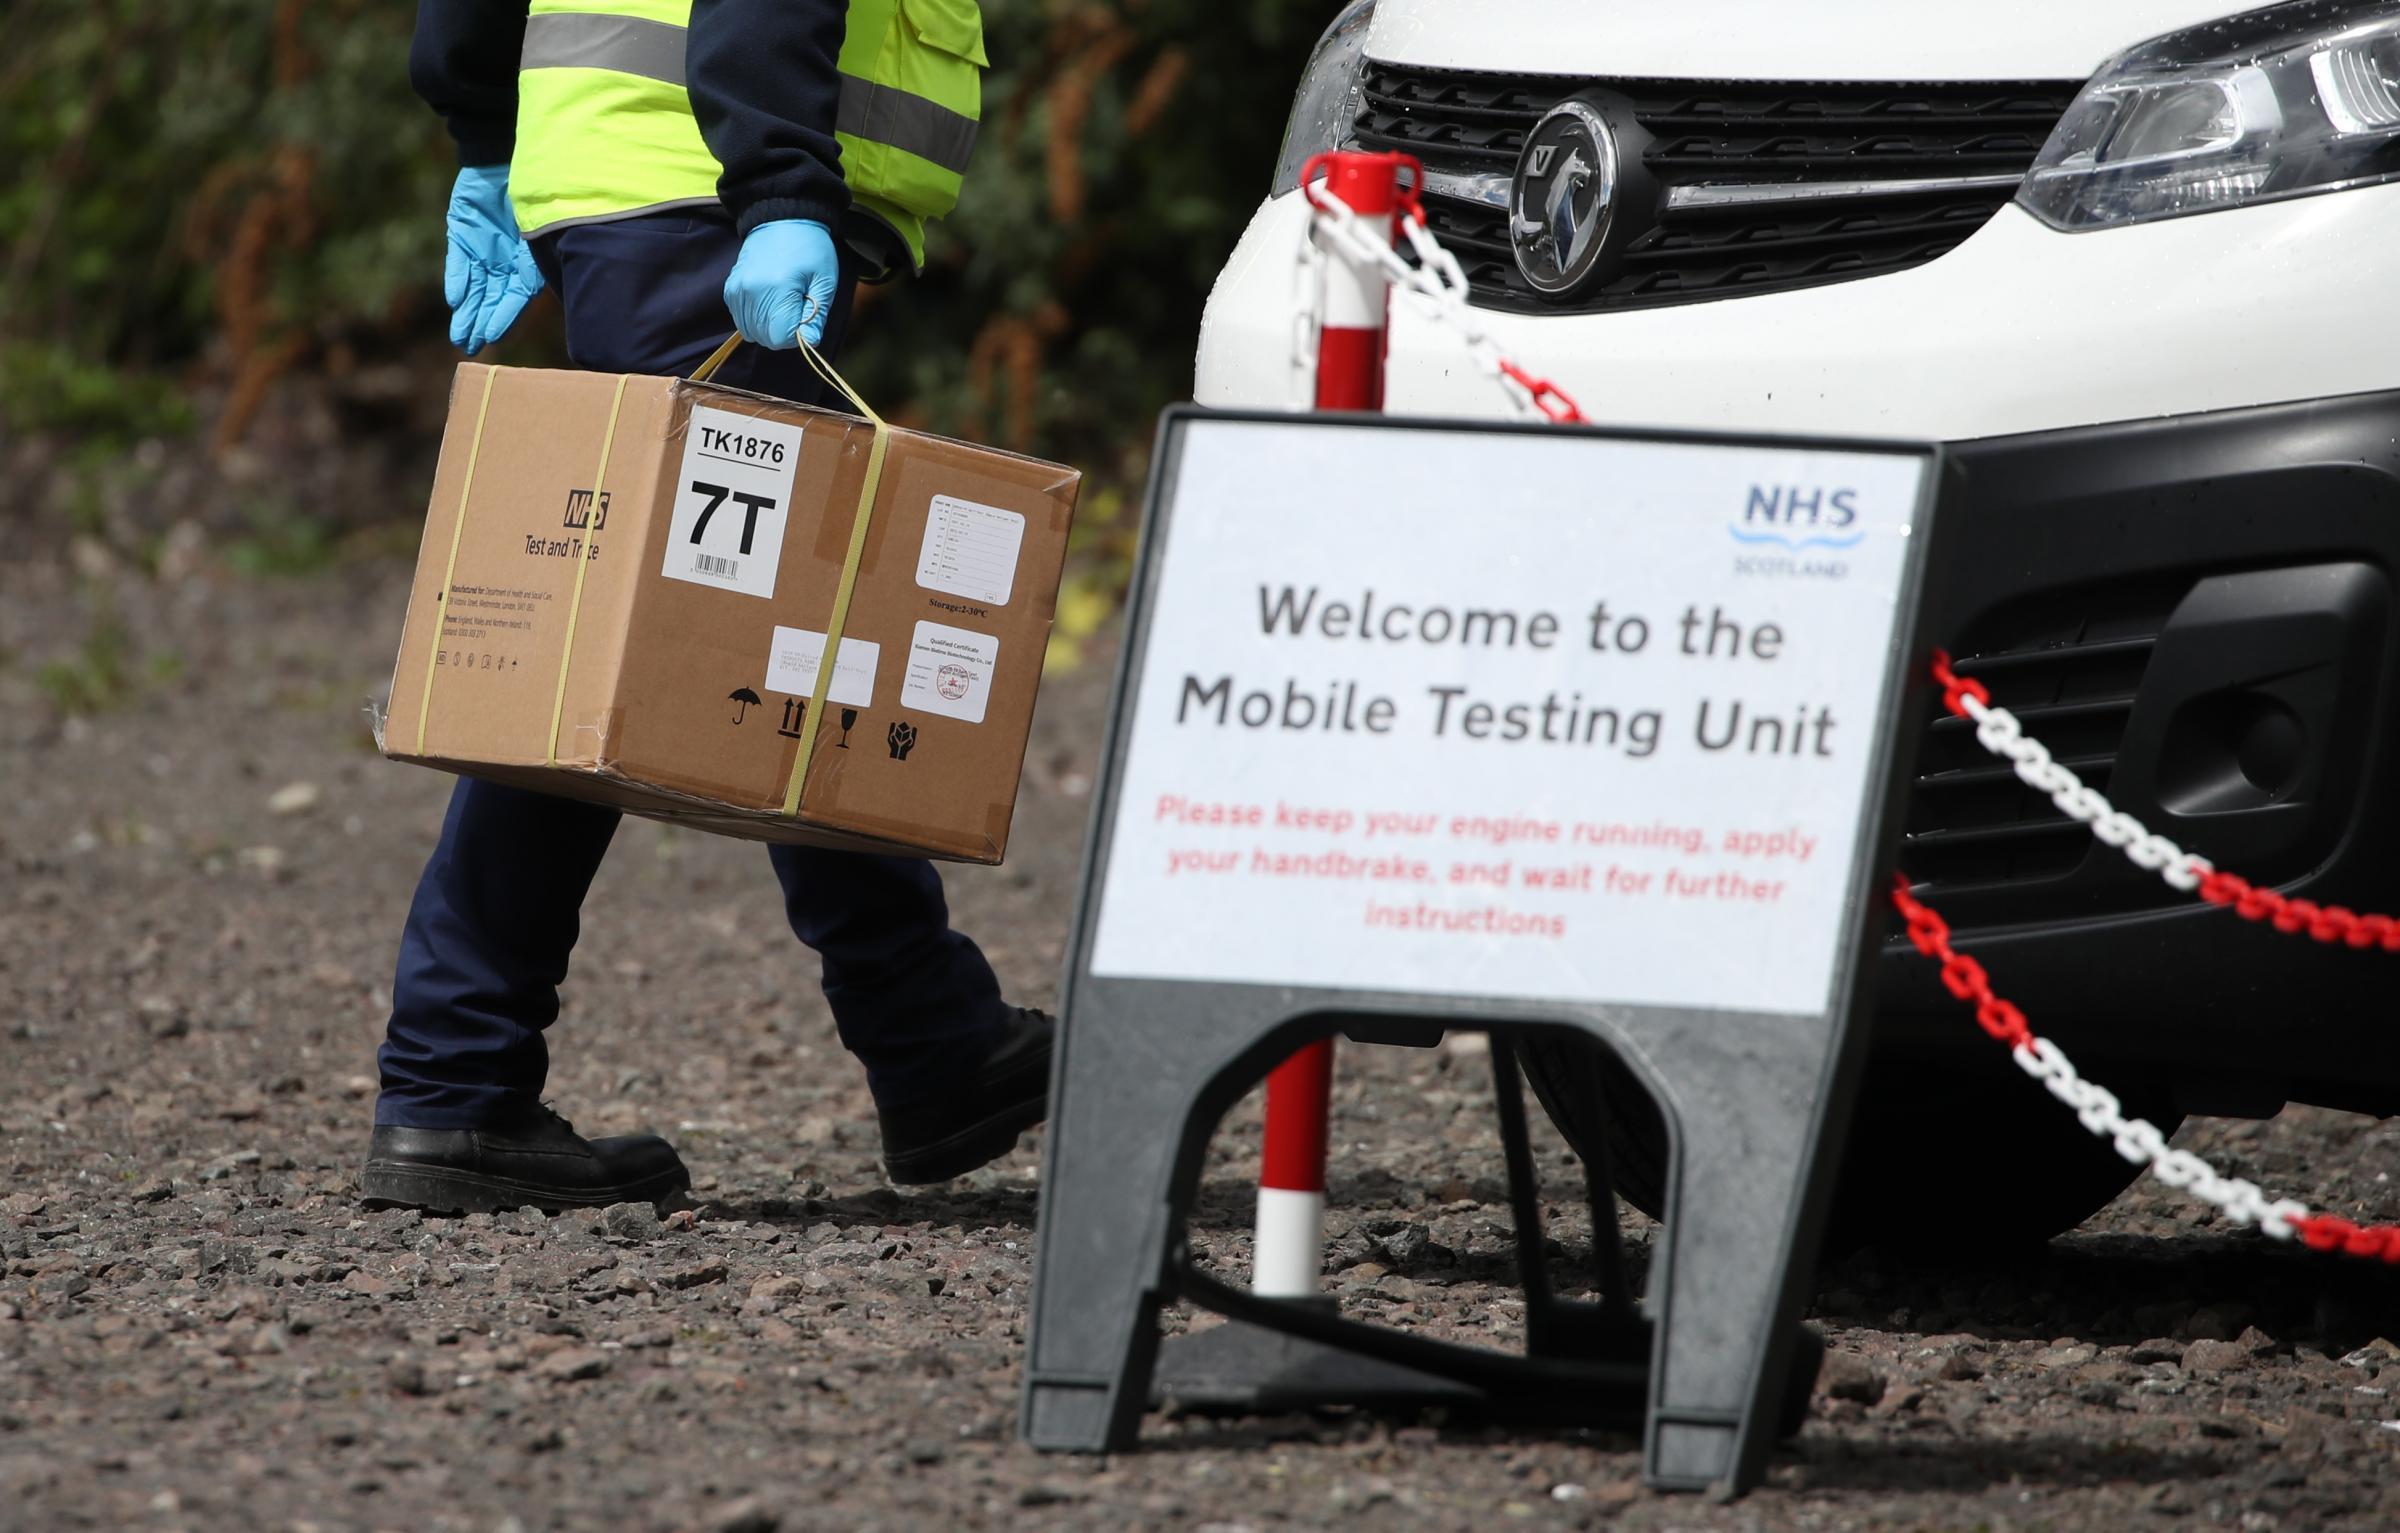 Covid Scotland LIVE: Delta variant accounts for 91 per cent of UK coronavirus cases